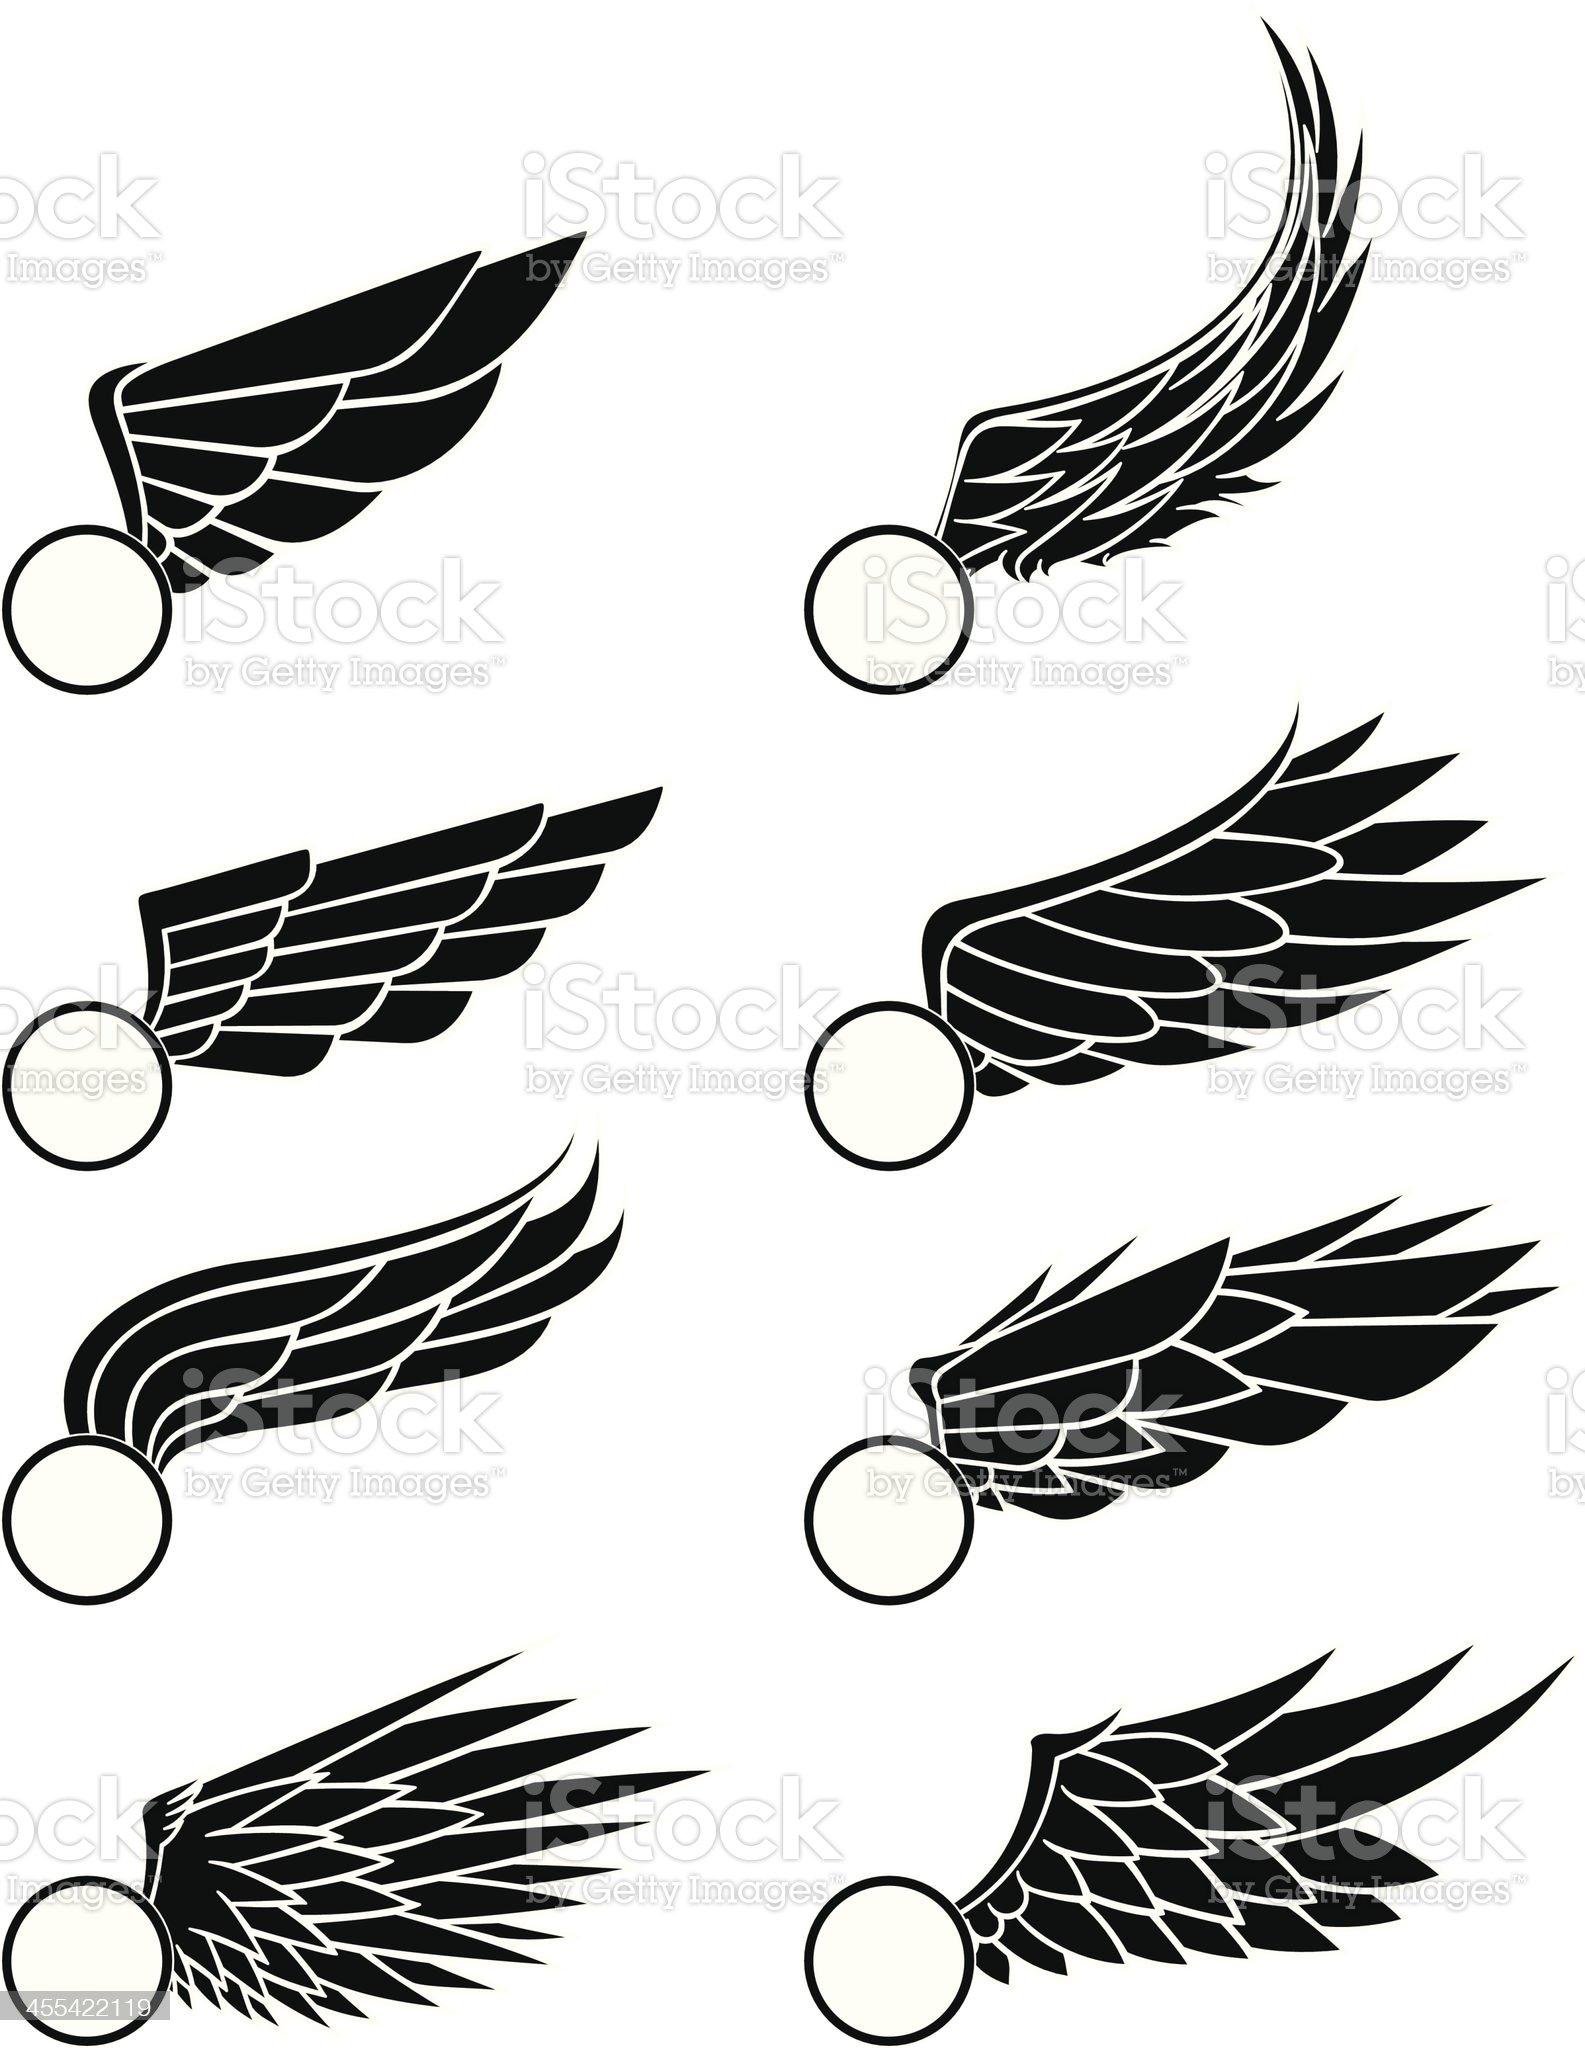 wings illustration. royalty-free stock vector art